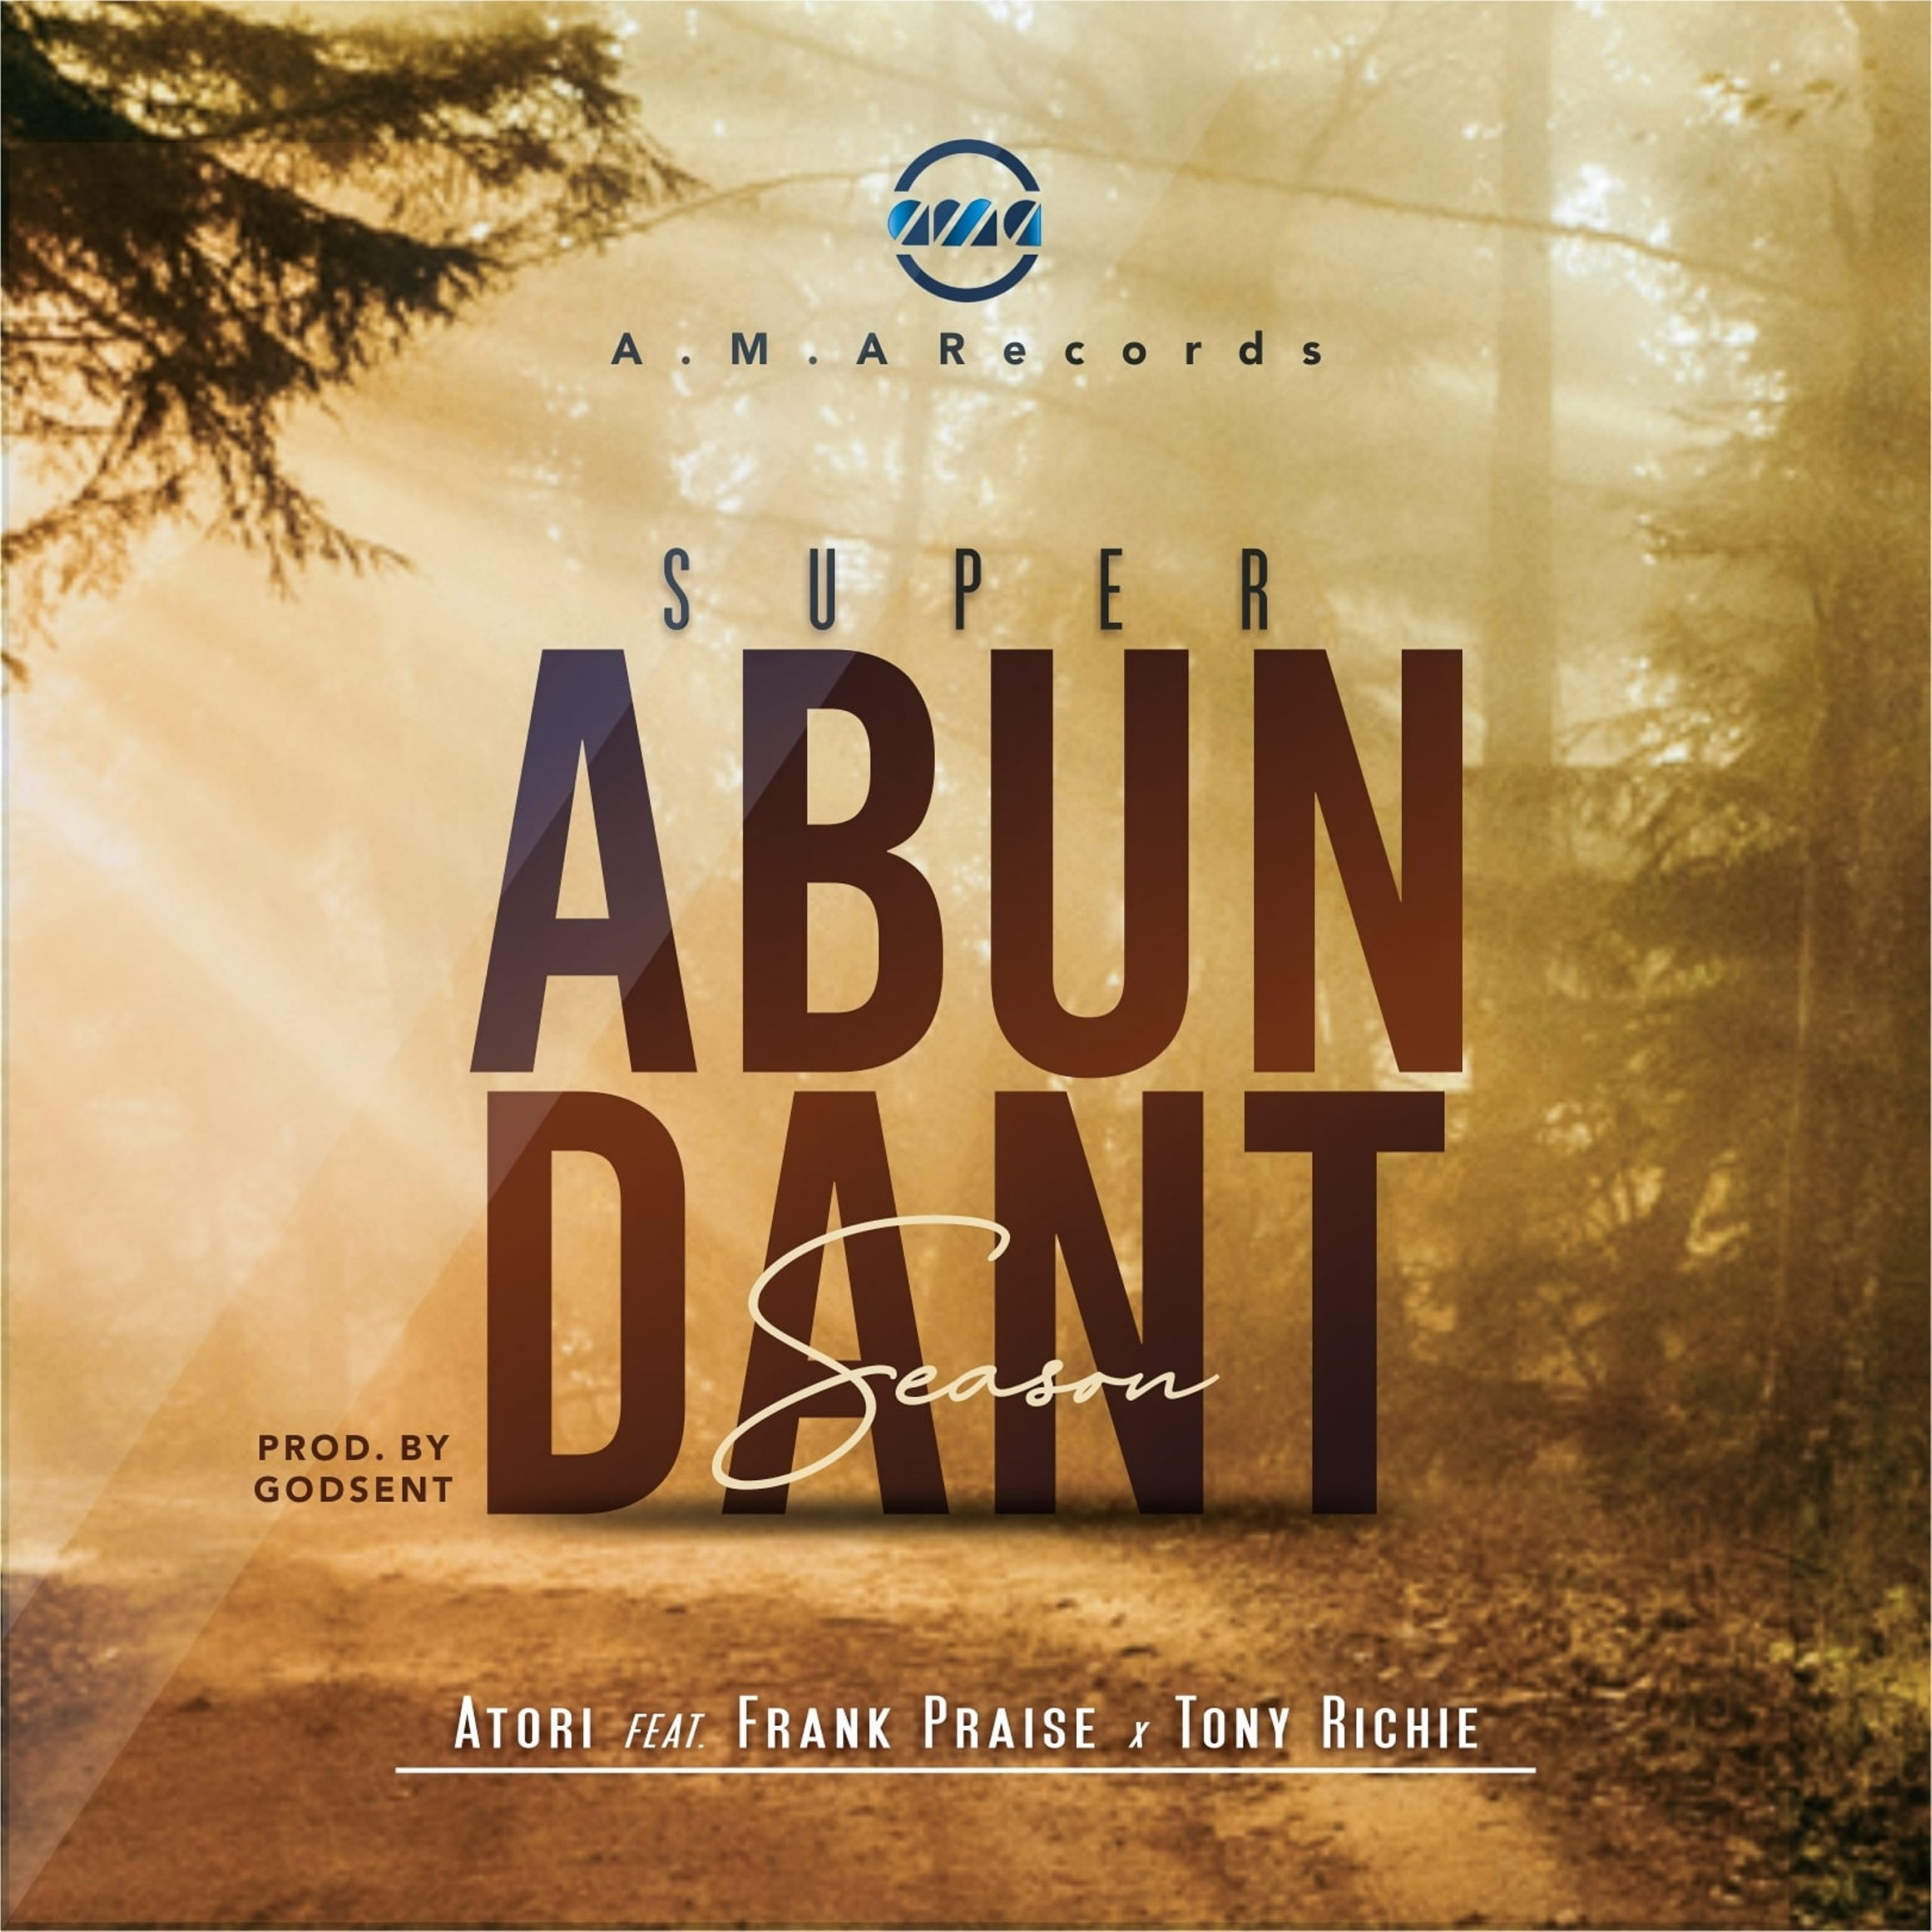 Atori - Superabundant Season ft. Tony Richie and Frank Praise